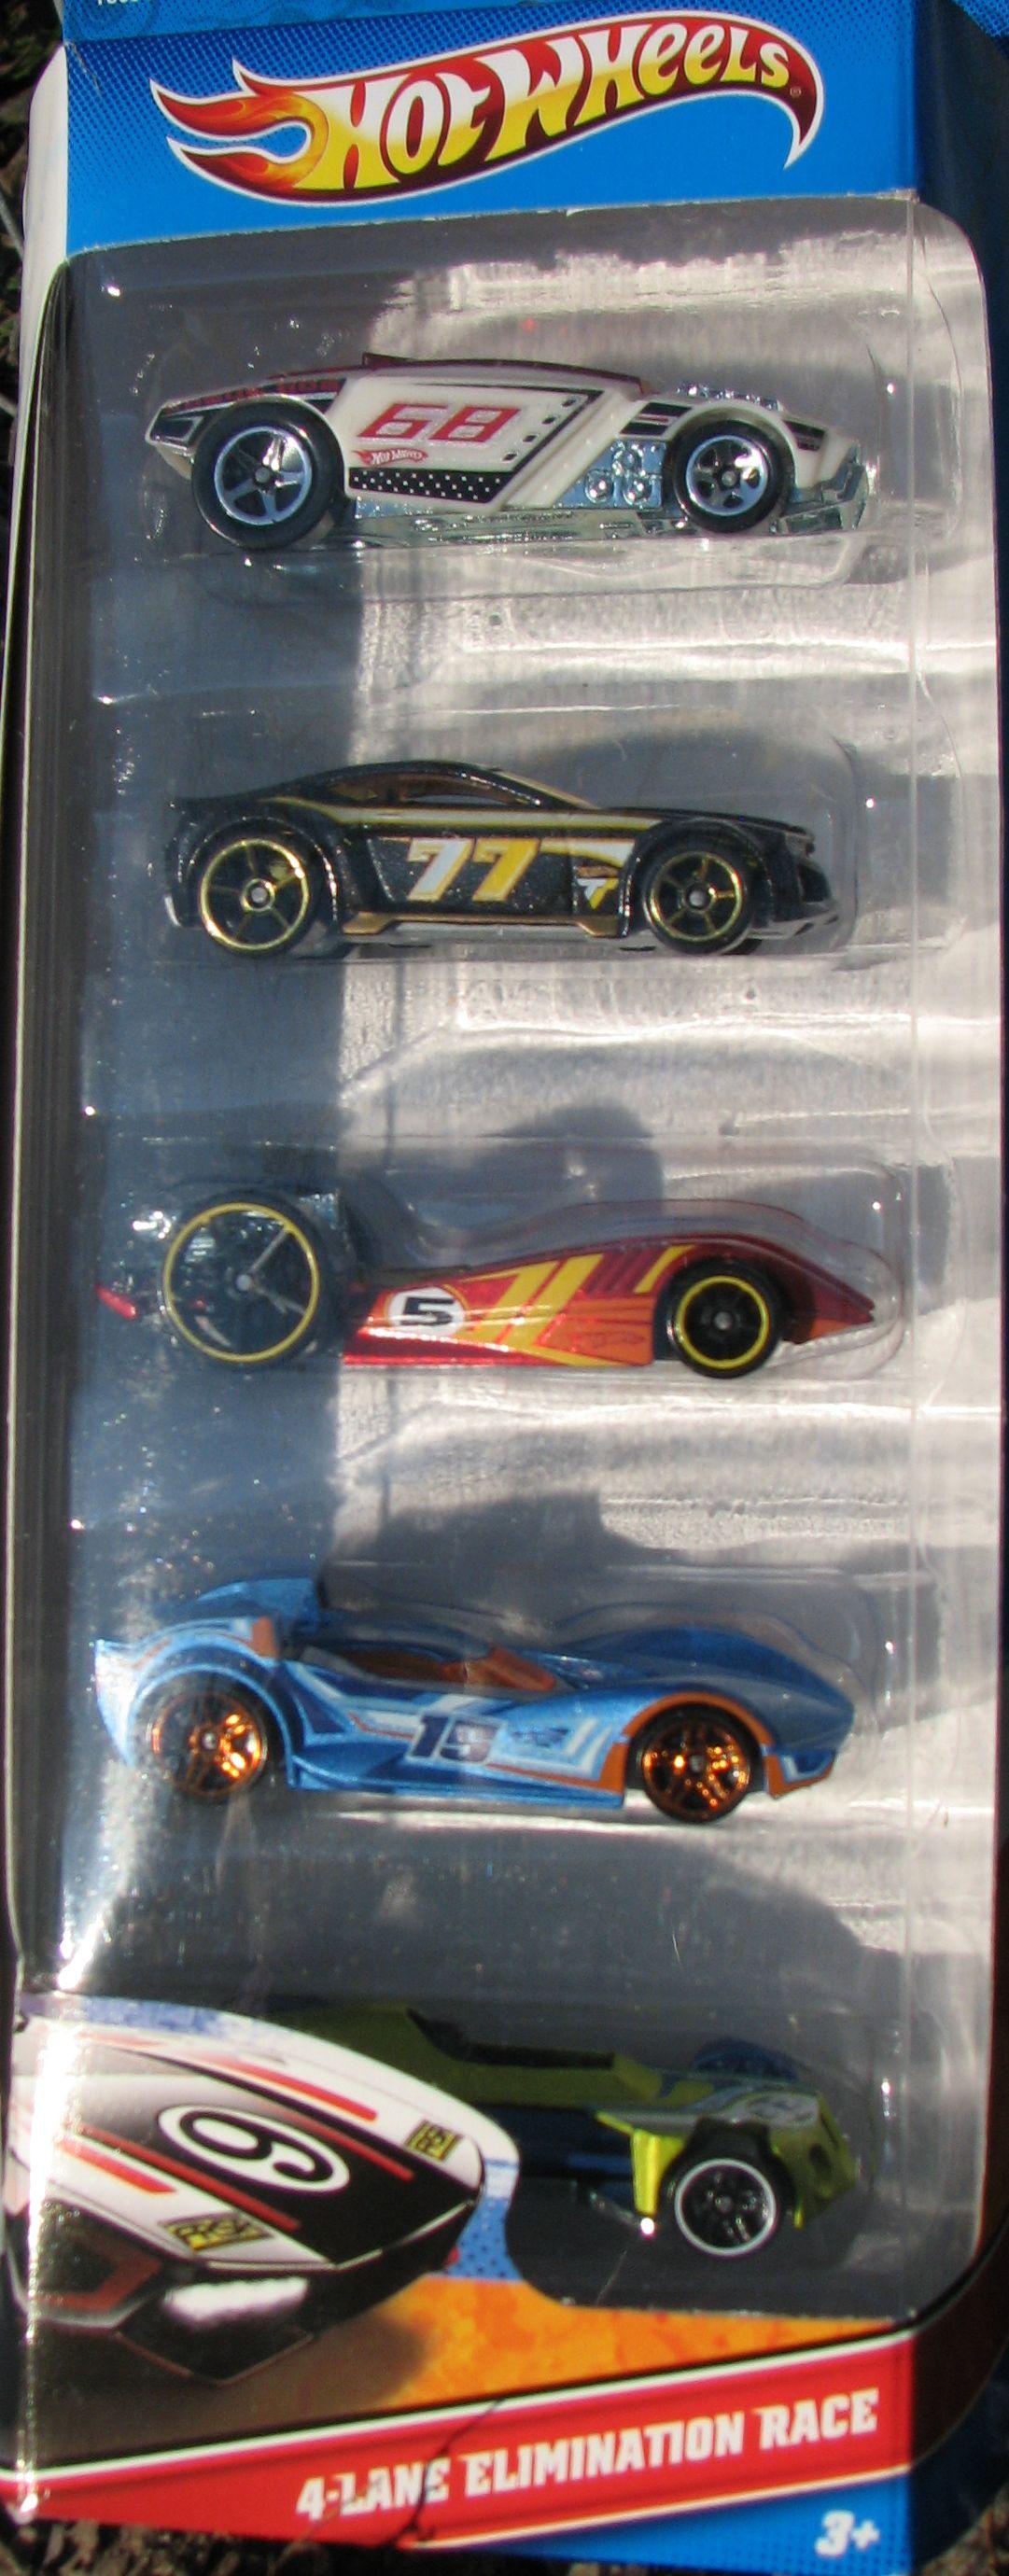 Red Window Tint >> 4-Lane Elimination Race 5-Pack - Hot Wheels Wiki